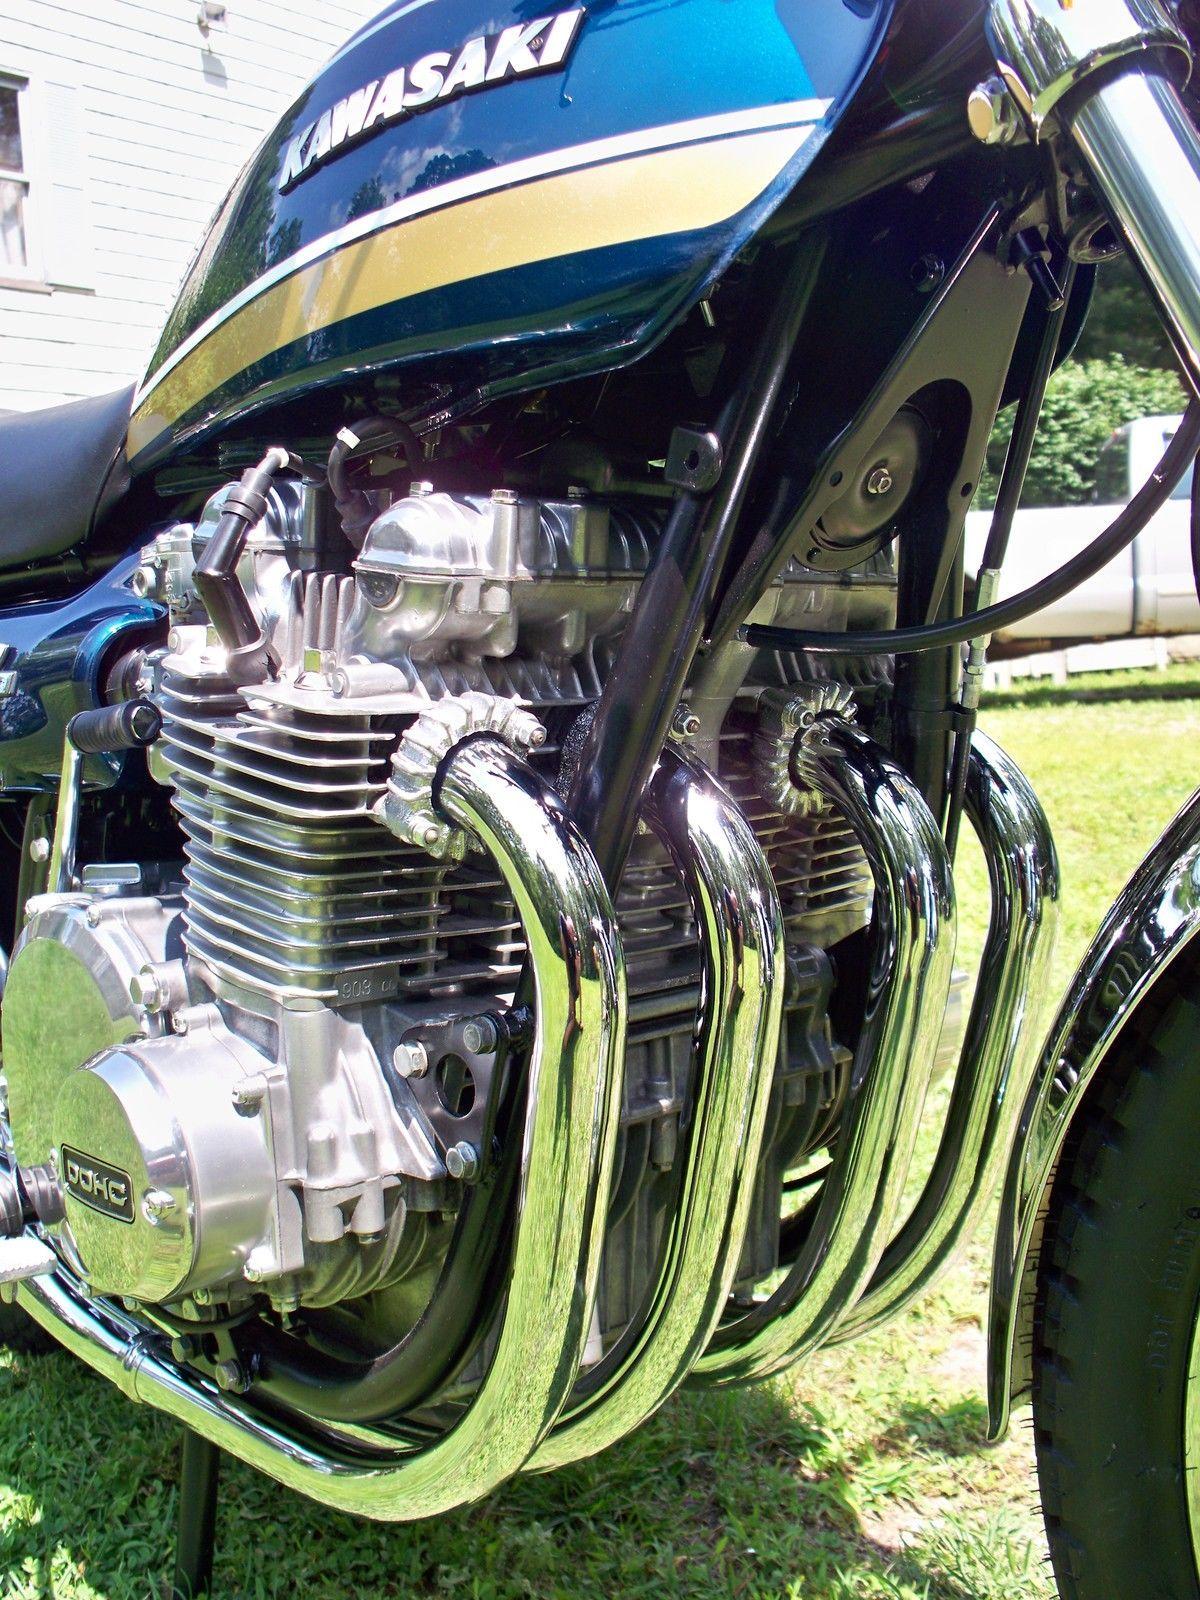 Kawasaki : Other | Engine, Clic bikes and Japanese cars